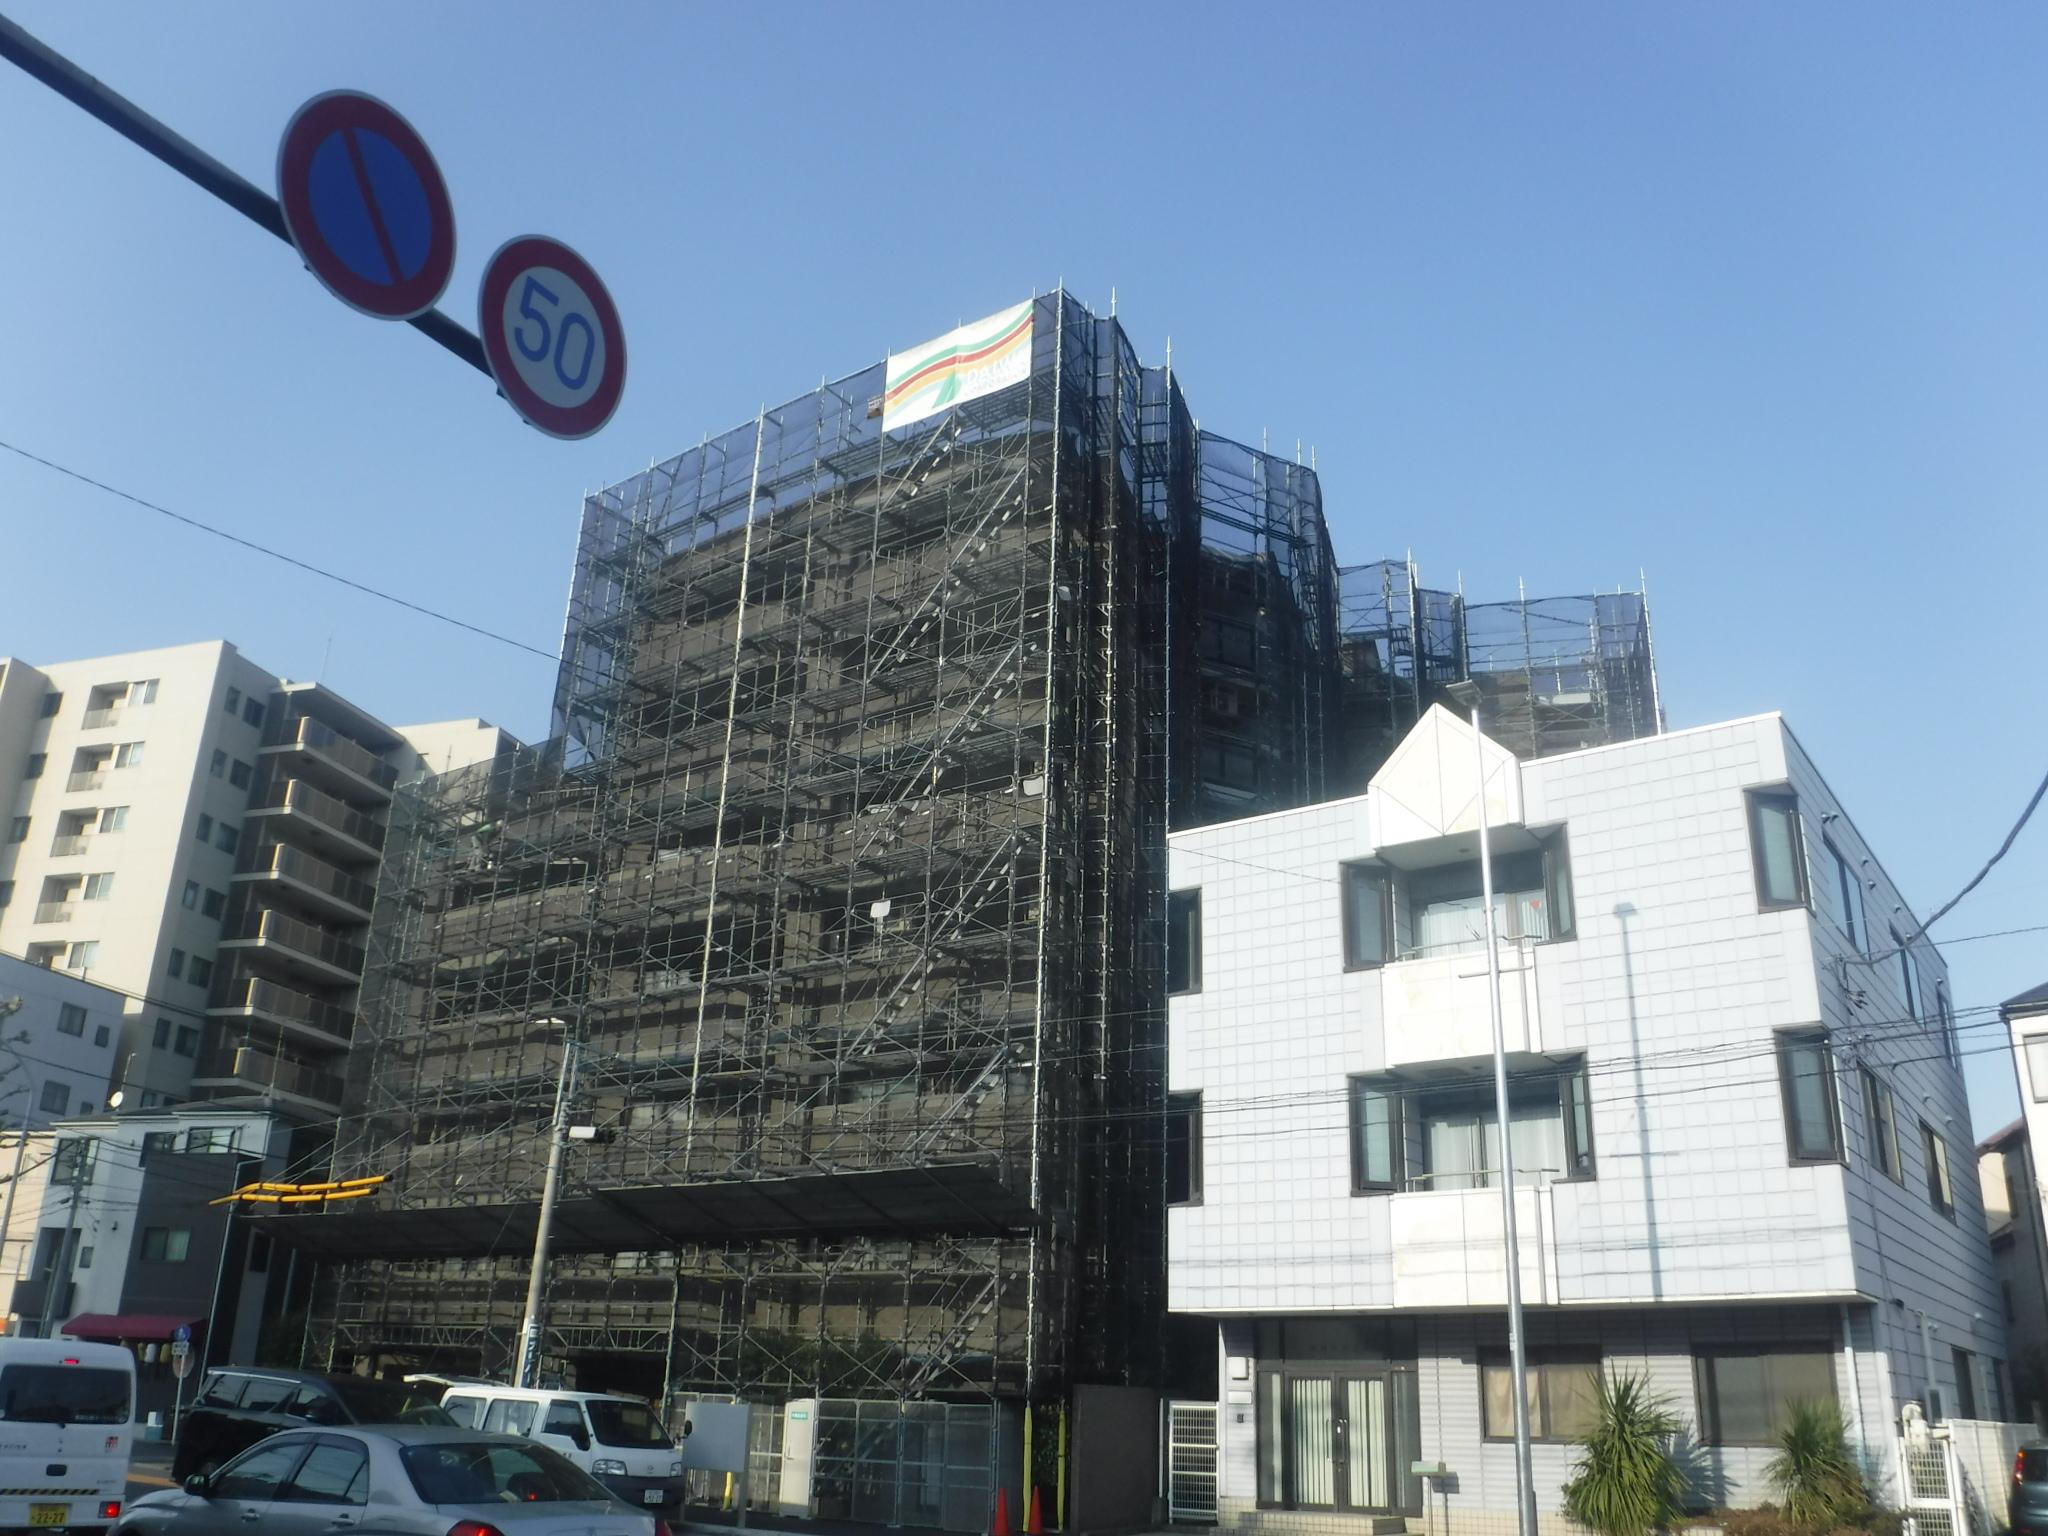 NICE URBAN 鶴見フロンテージ大規模修繕工事